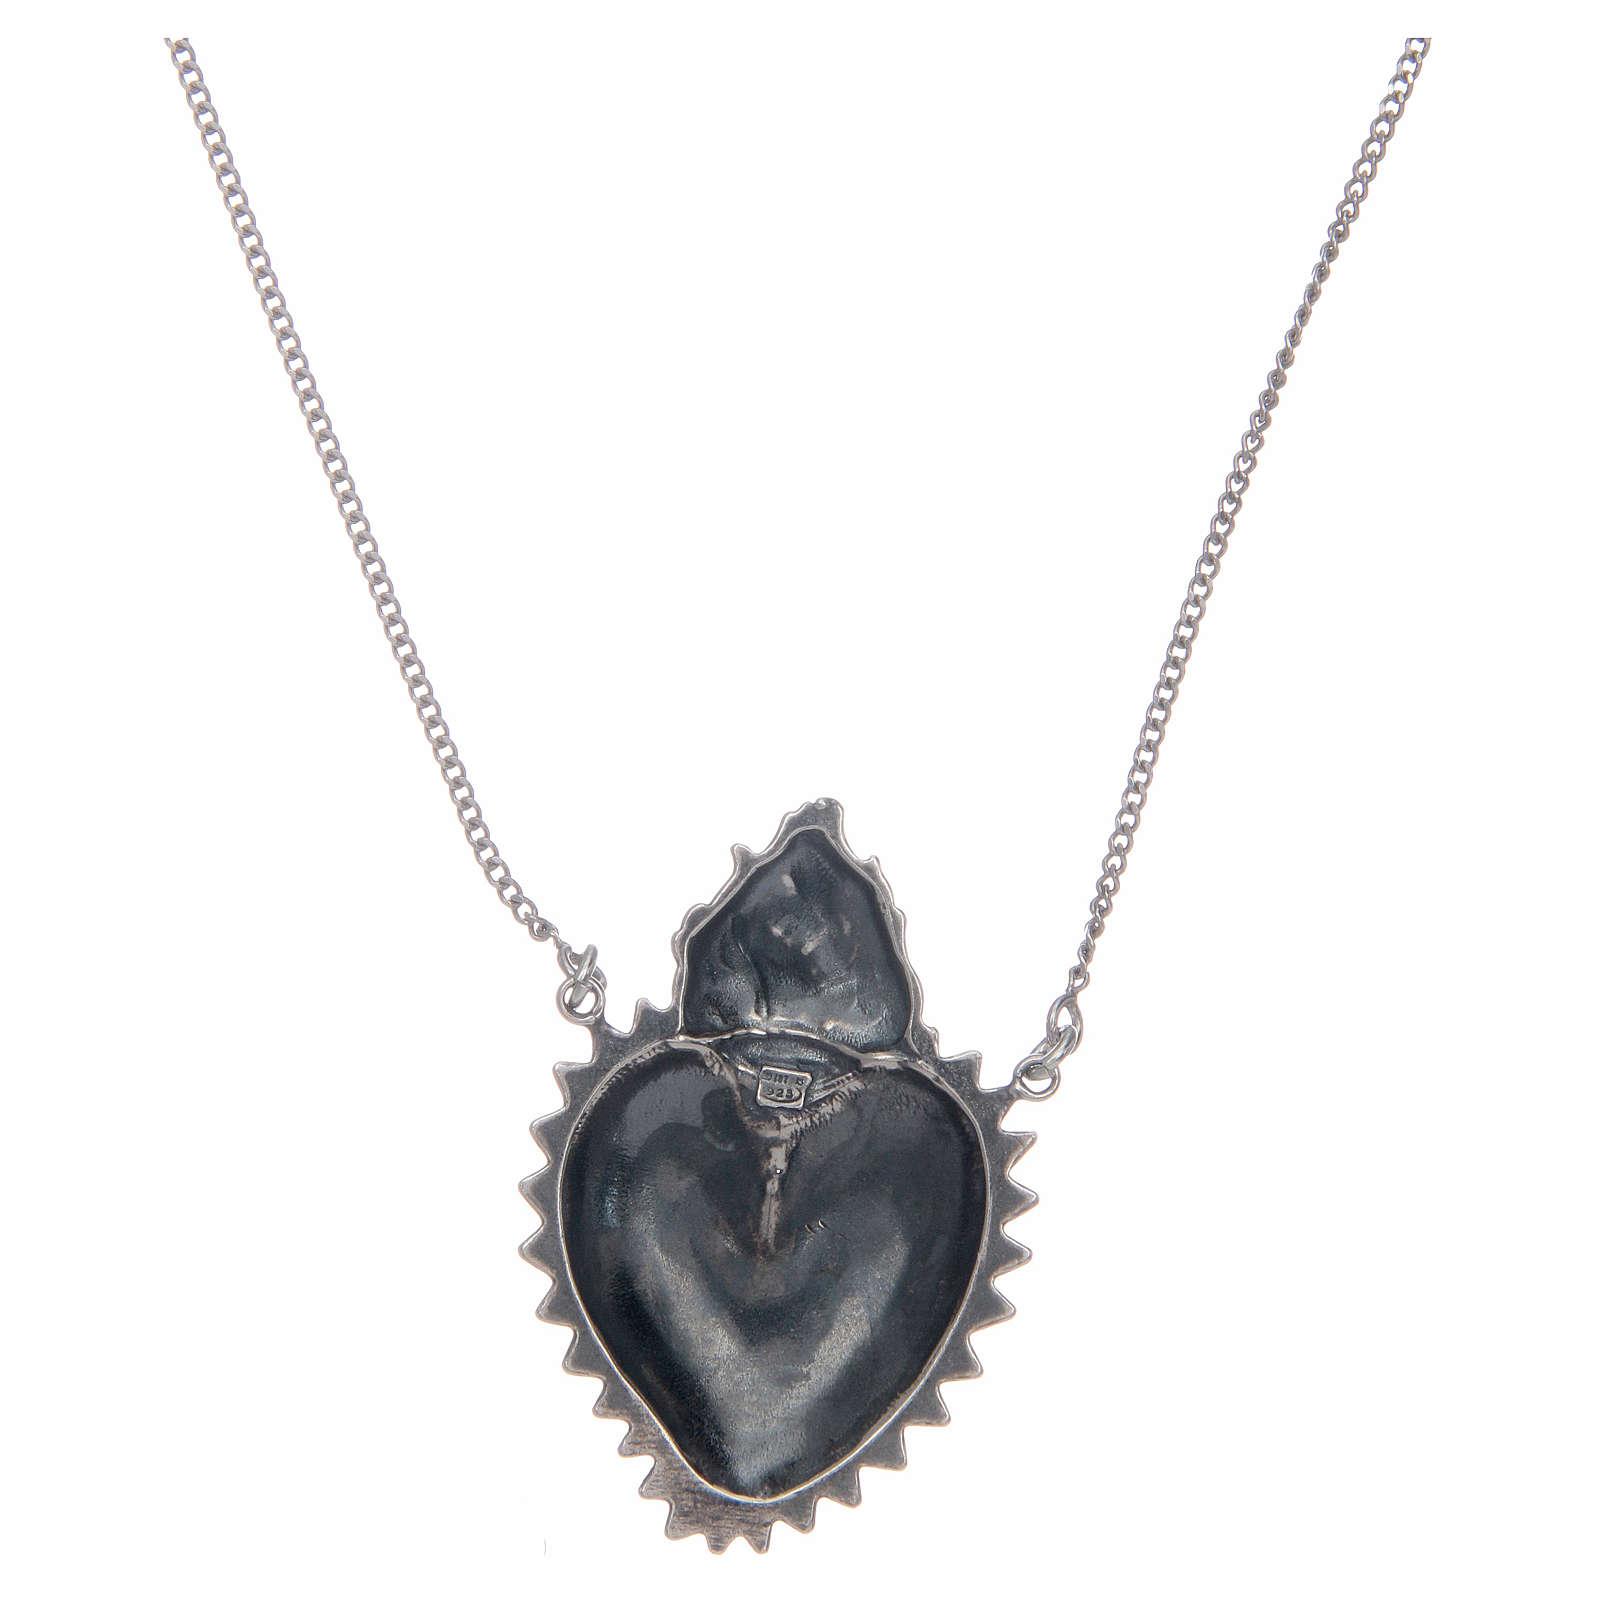 Girocollo cuore votivo argento 925 cm 2 4